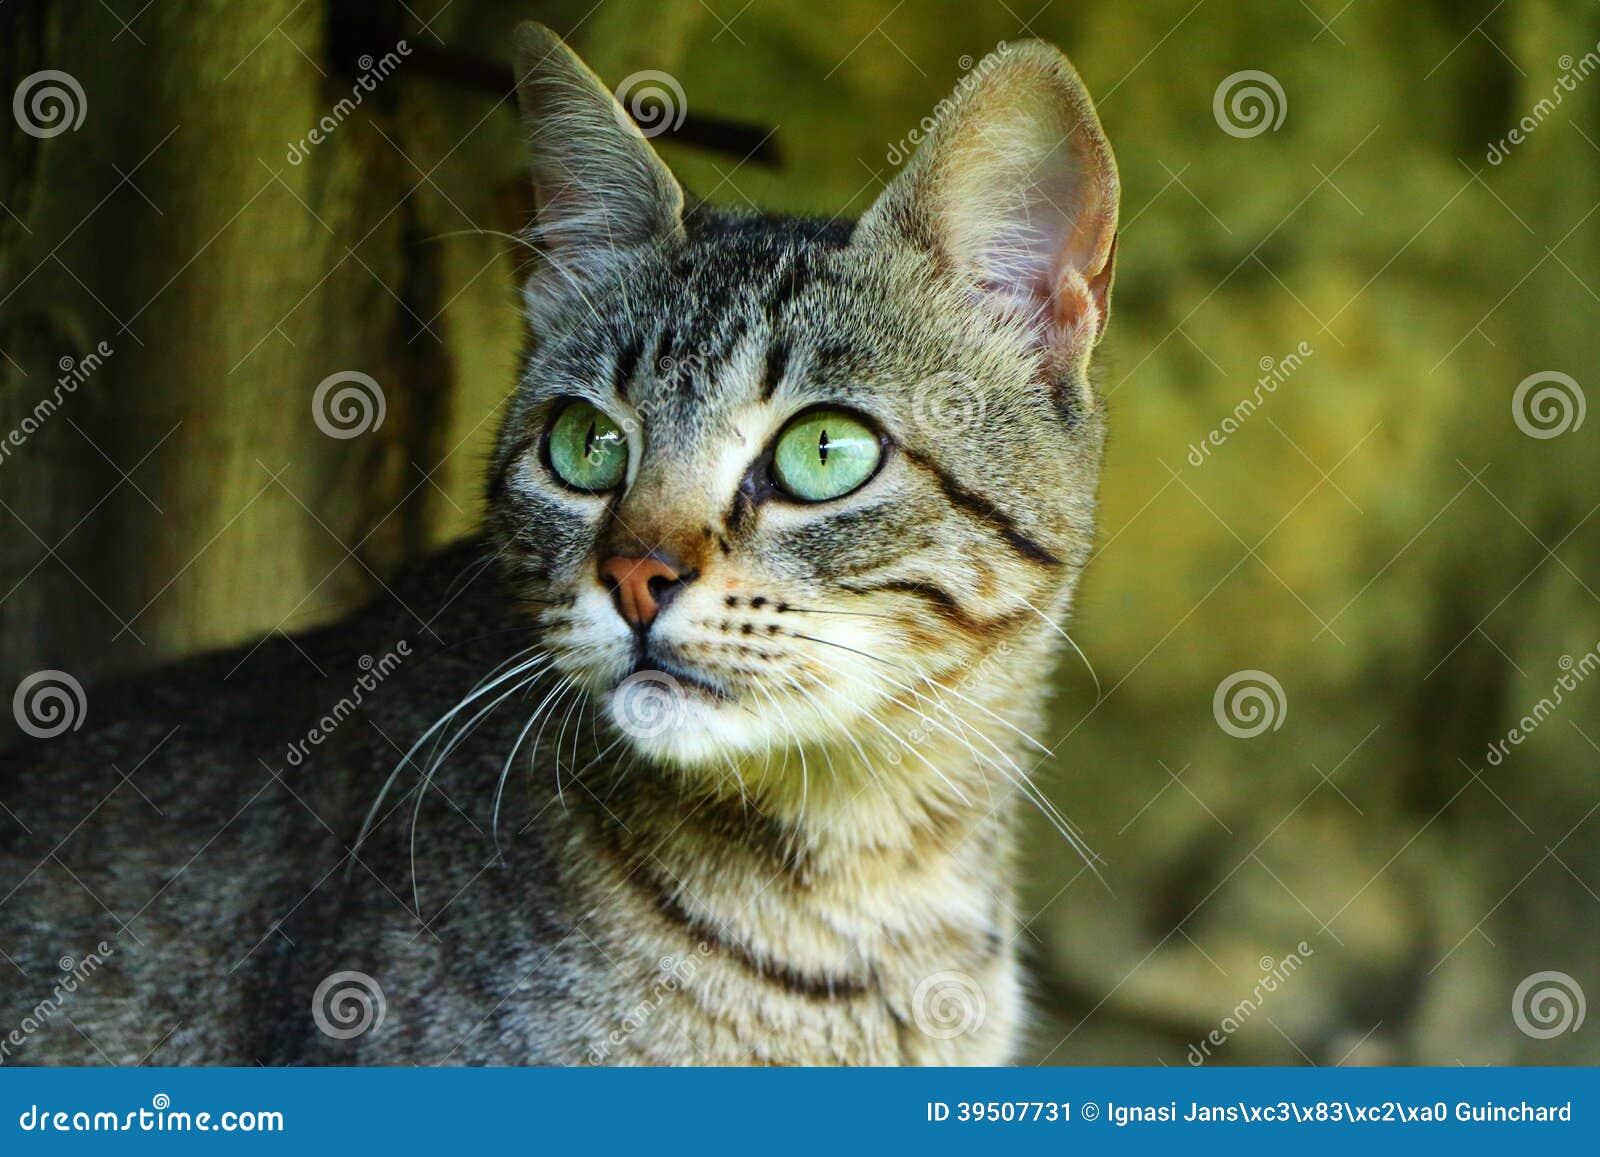 Cats Gazing